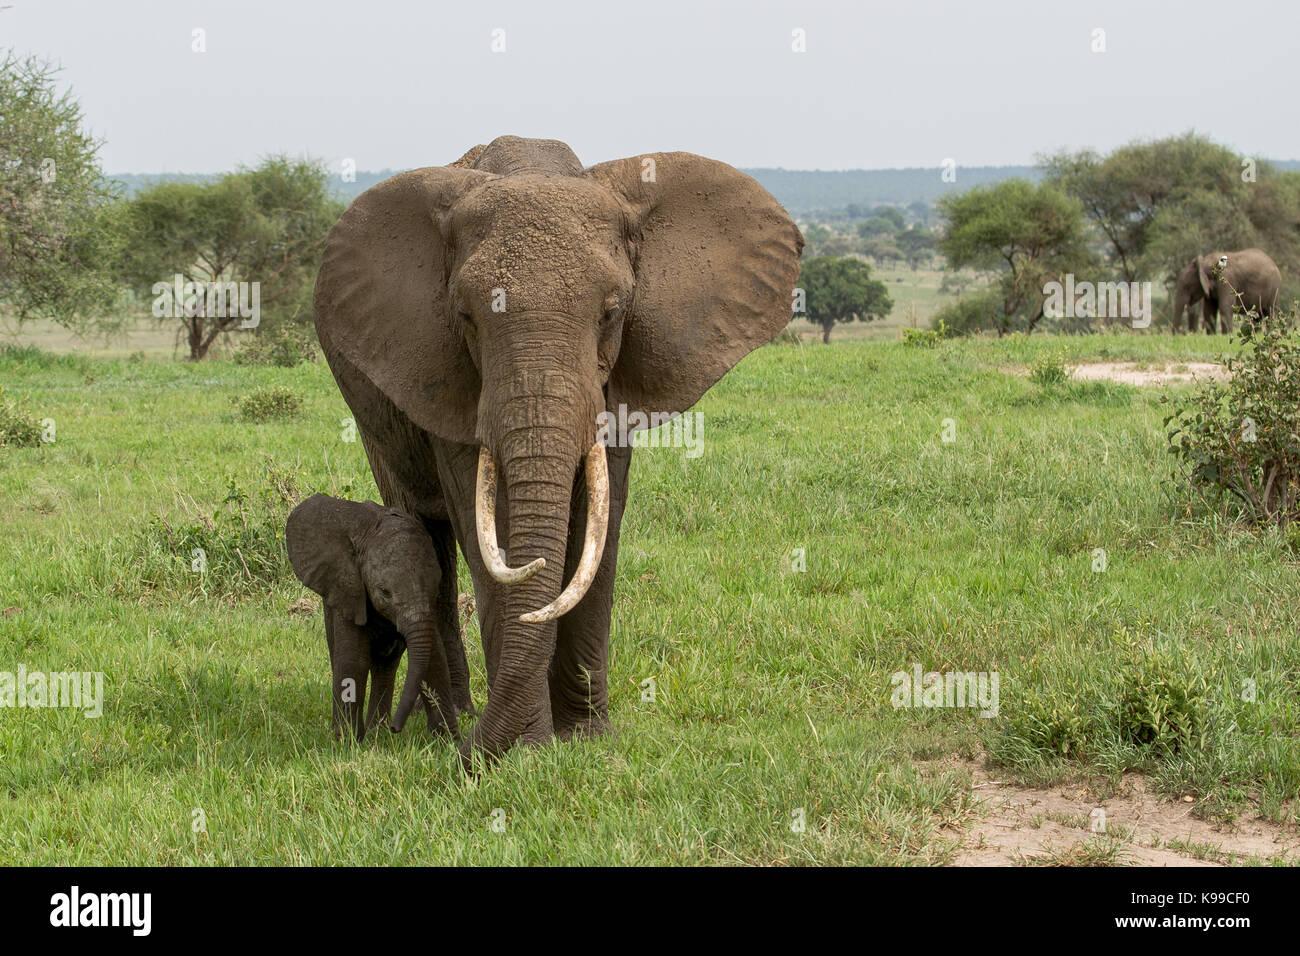 Elephants in Tarangire National Park - Stock Image